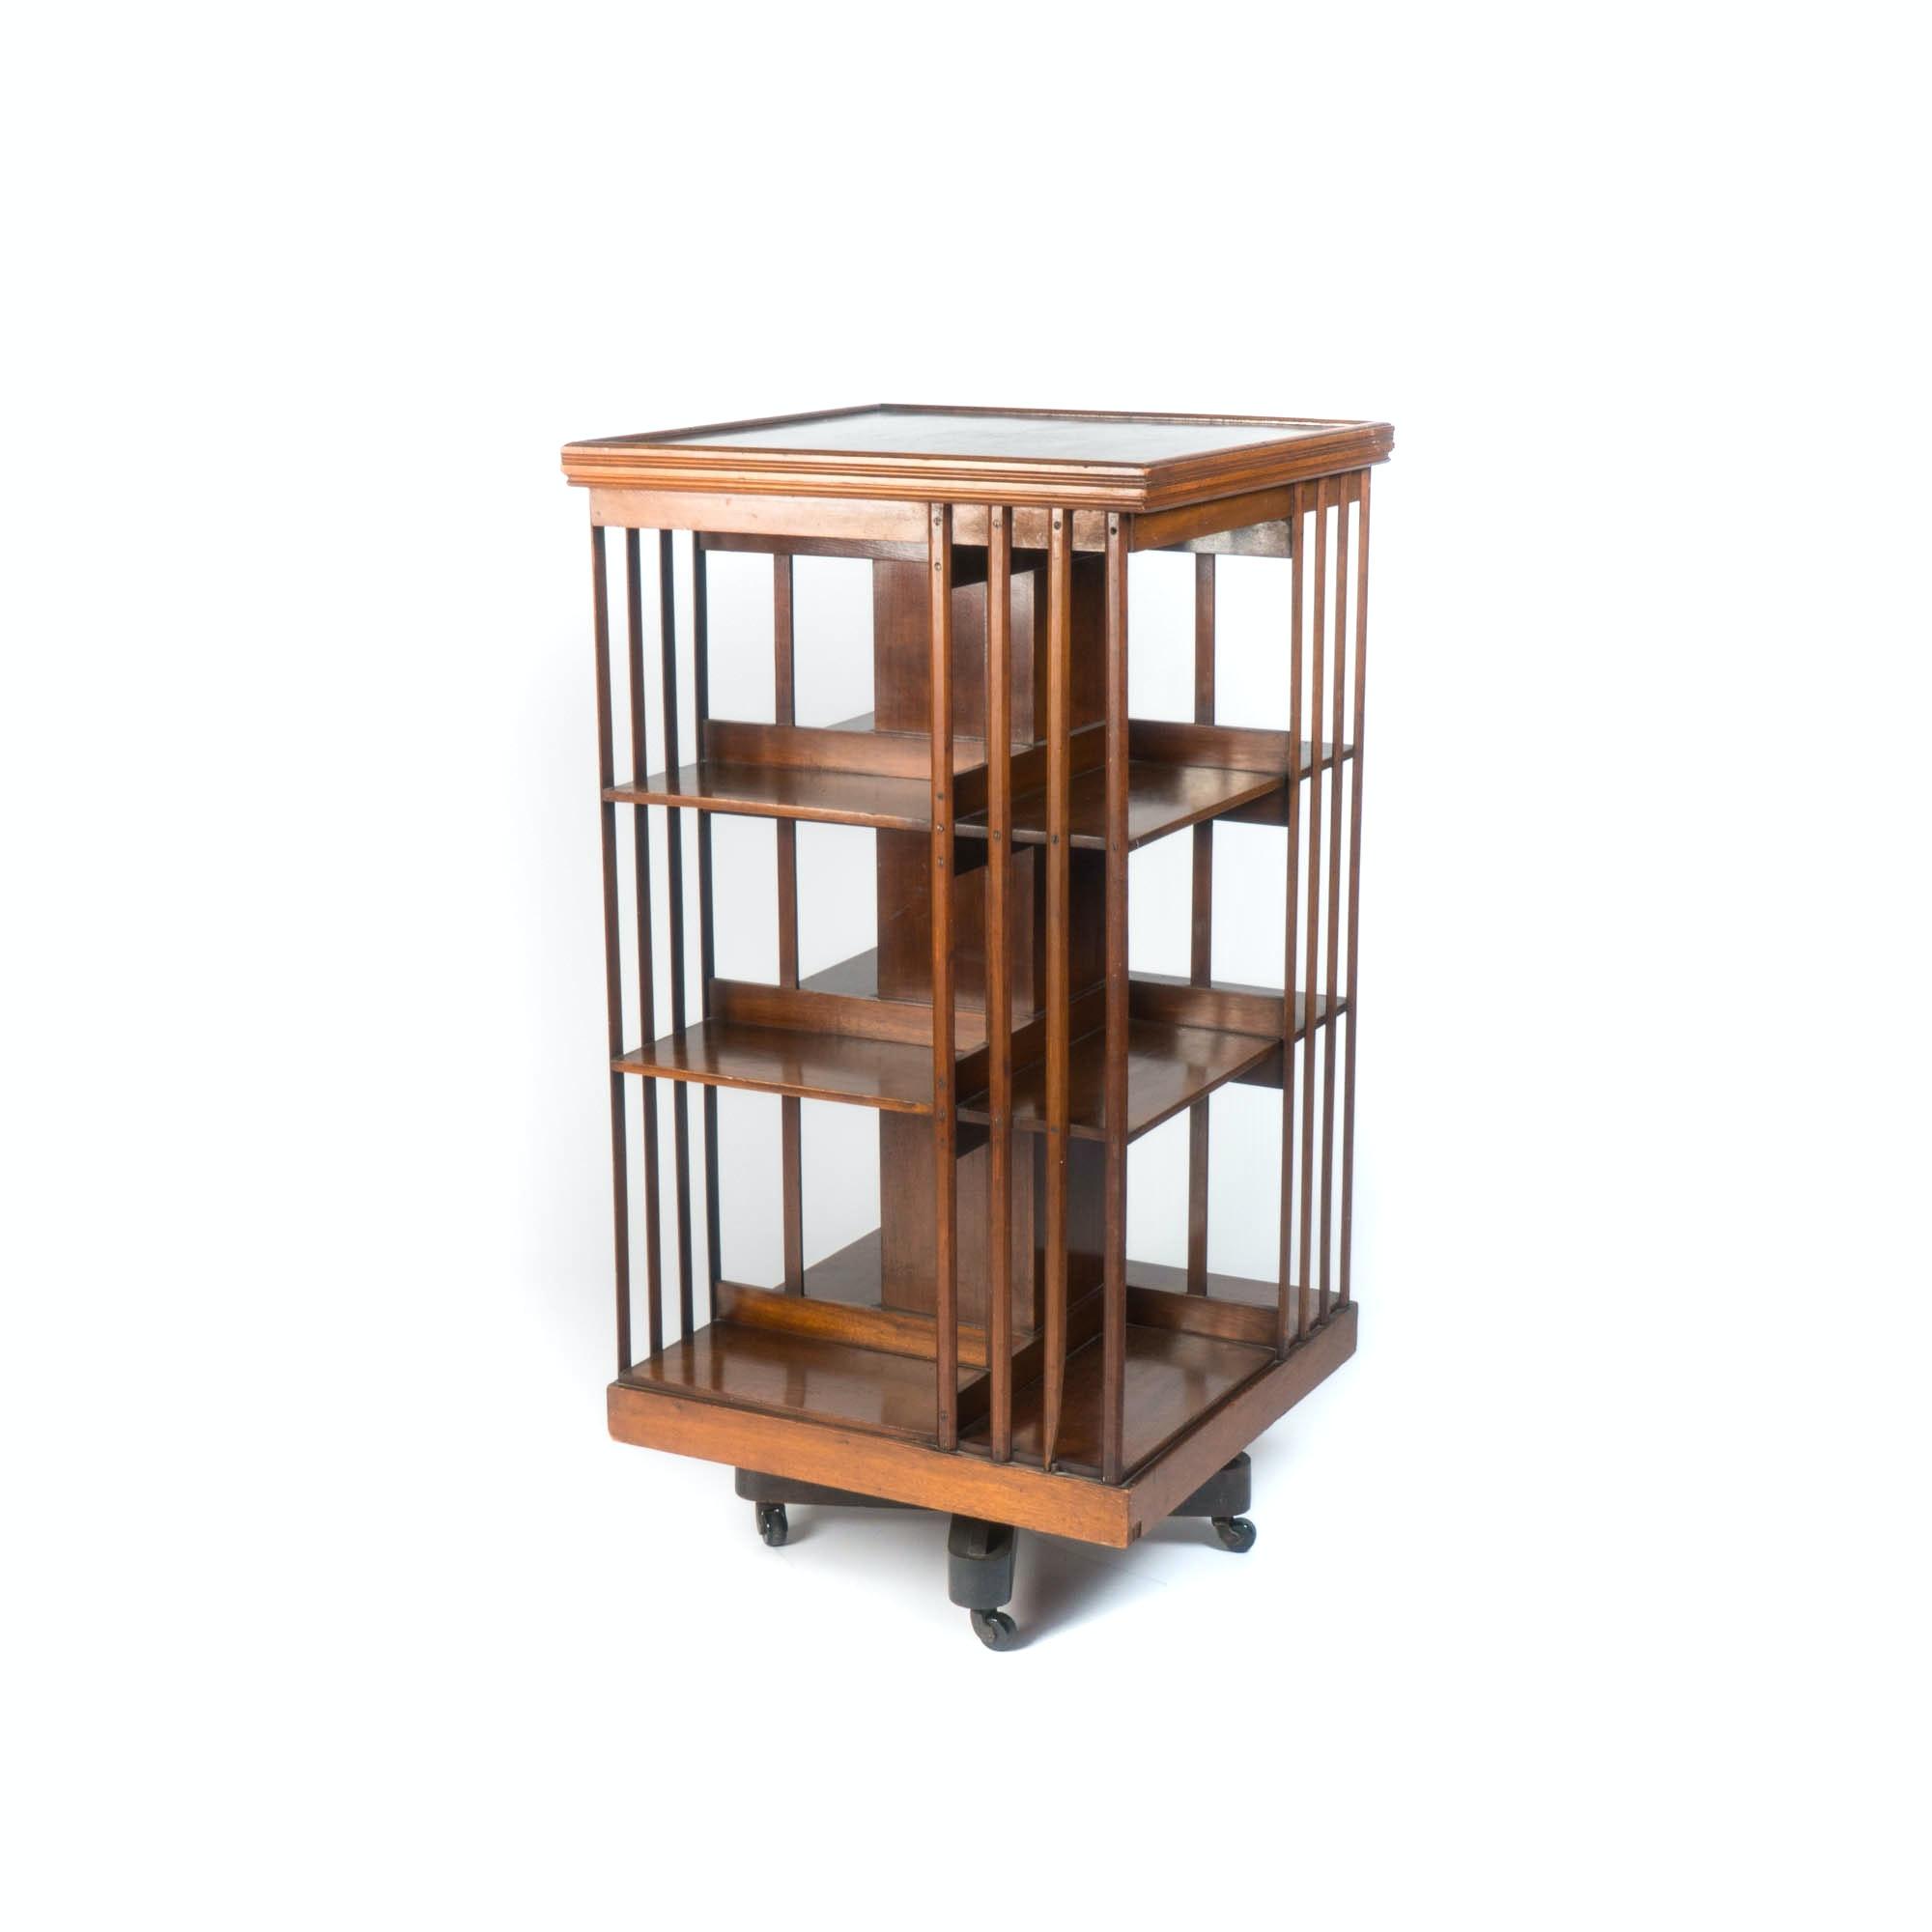 Circa 1900 English Revolving Bookcase